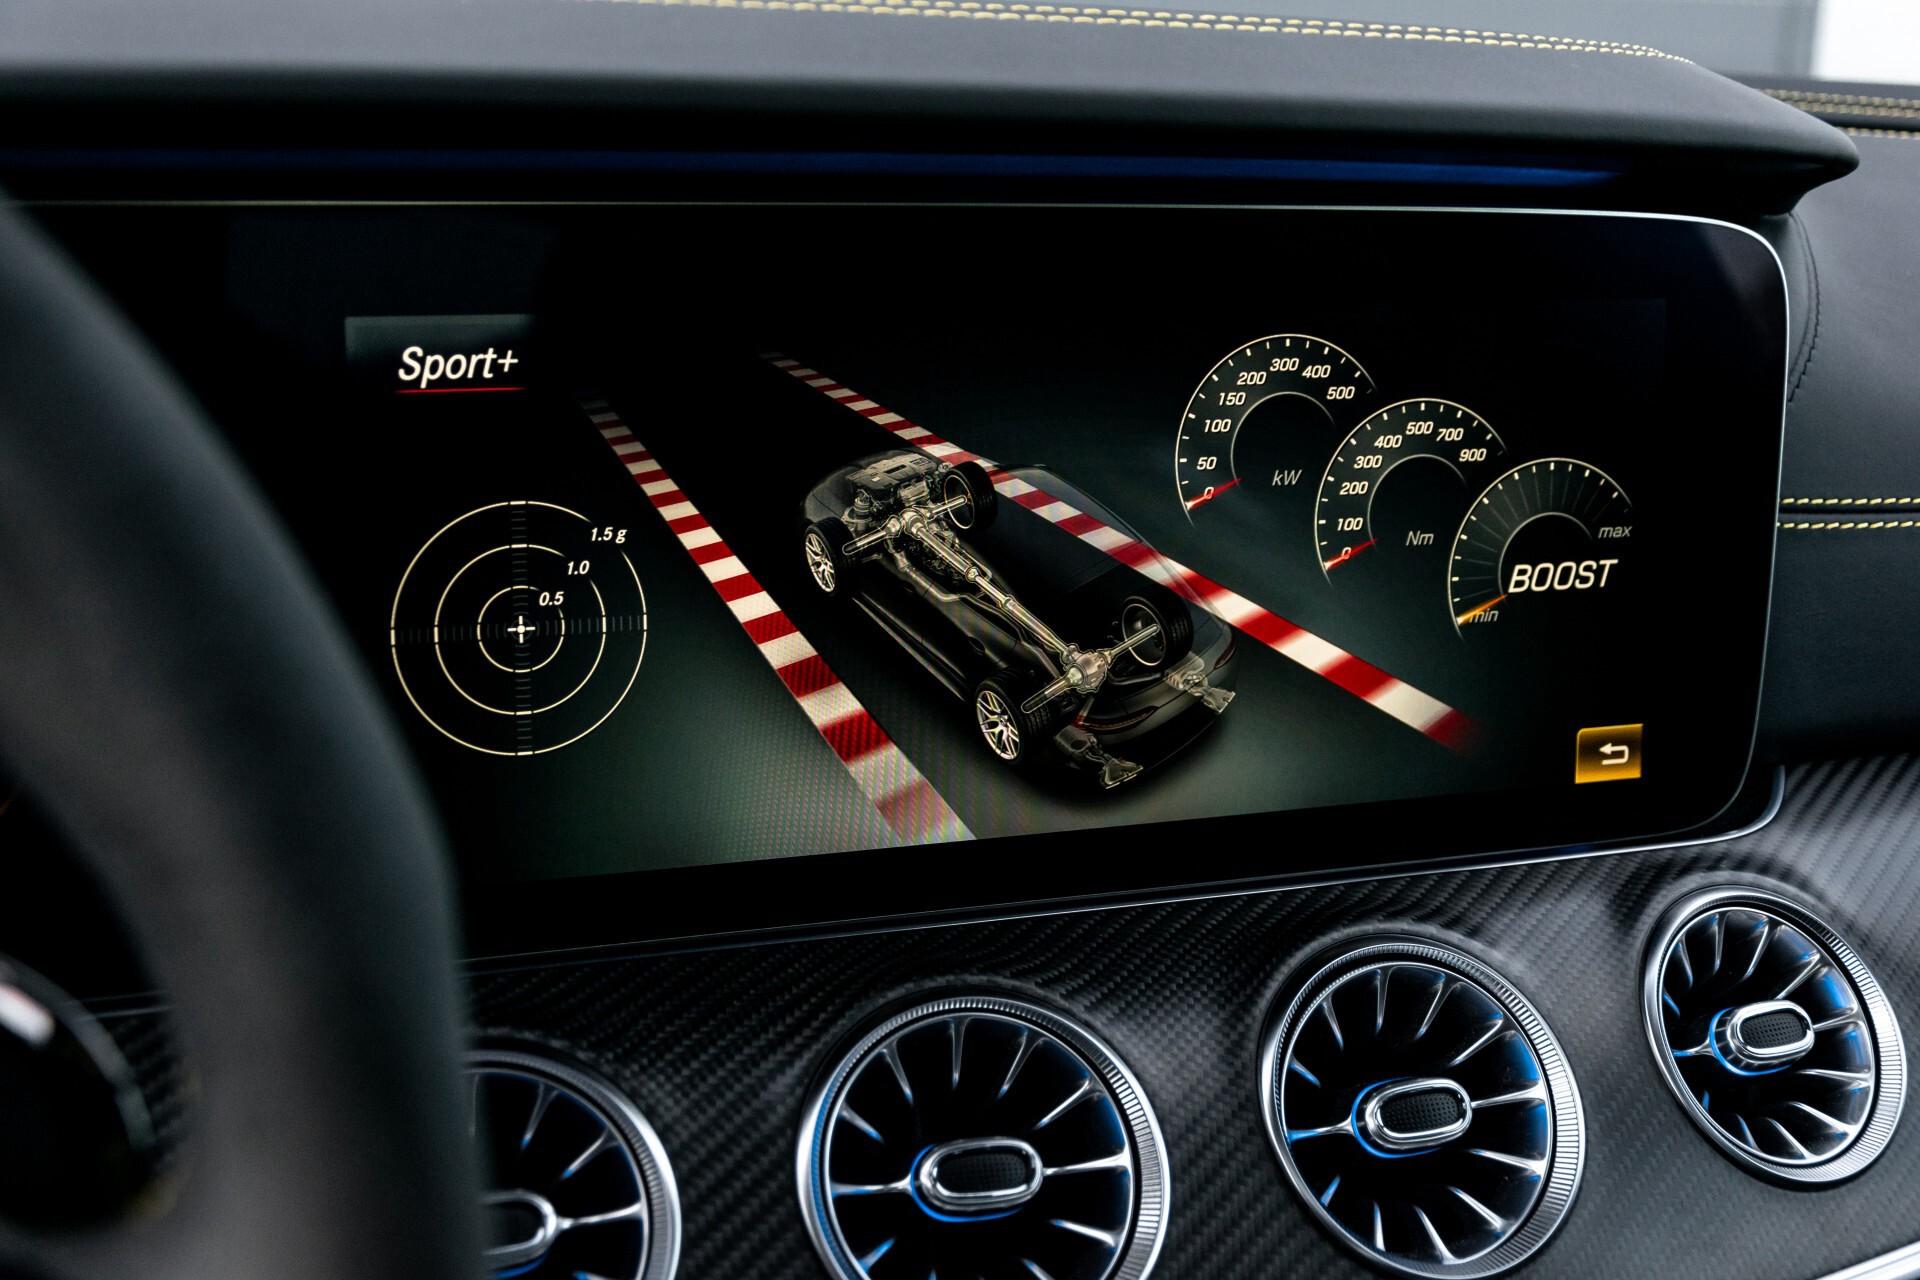 Mercedes-Benz AMG GT 4-Door Coupe 63 S 4MATIC+ Edition 1 Keramisch/Carbon/First Class/Dynamic Plus/Burmester High End 3D Aut9 Foto 39